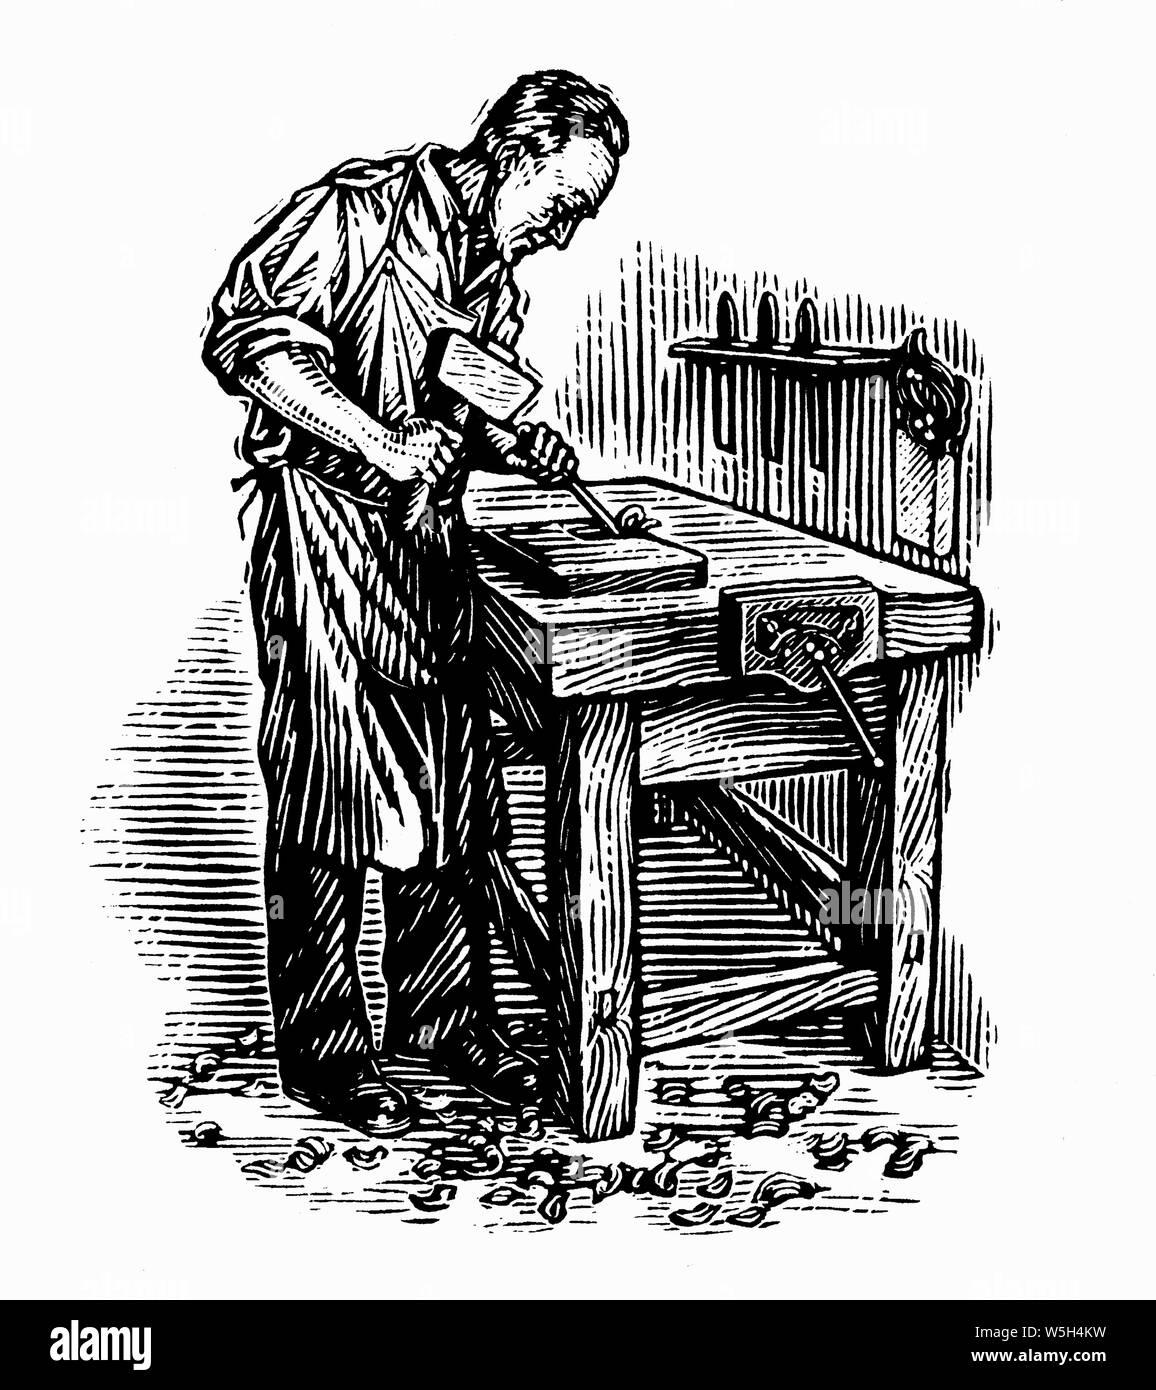 Black and white scraperboard engraving of skilled carpenter